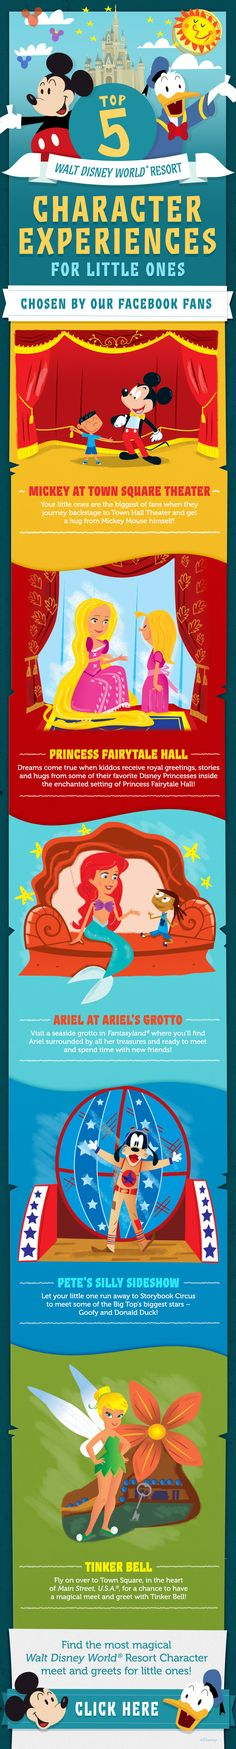 Top 5 Walt Disney World Character Experiences for little ones! #preschool #DisneyKids #Mickey #TinkerBell #Rapunzel #Ariel #Goofy